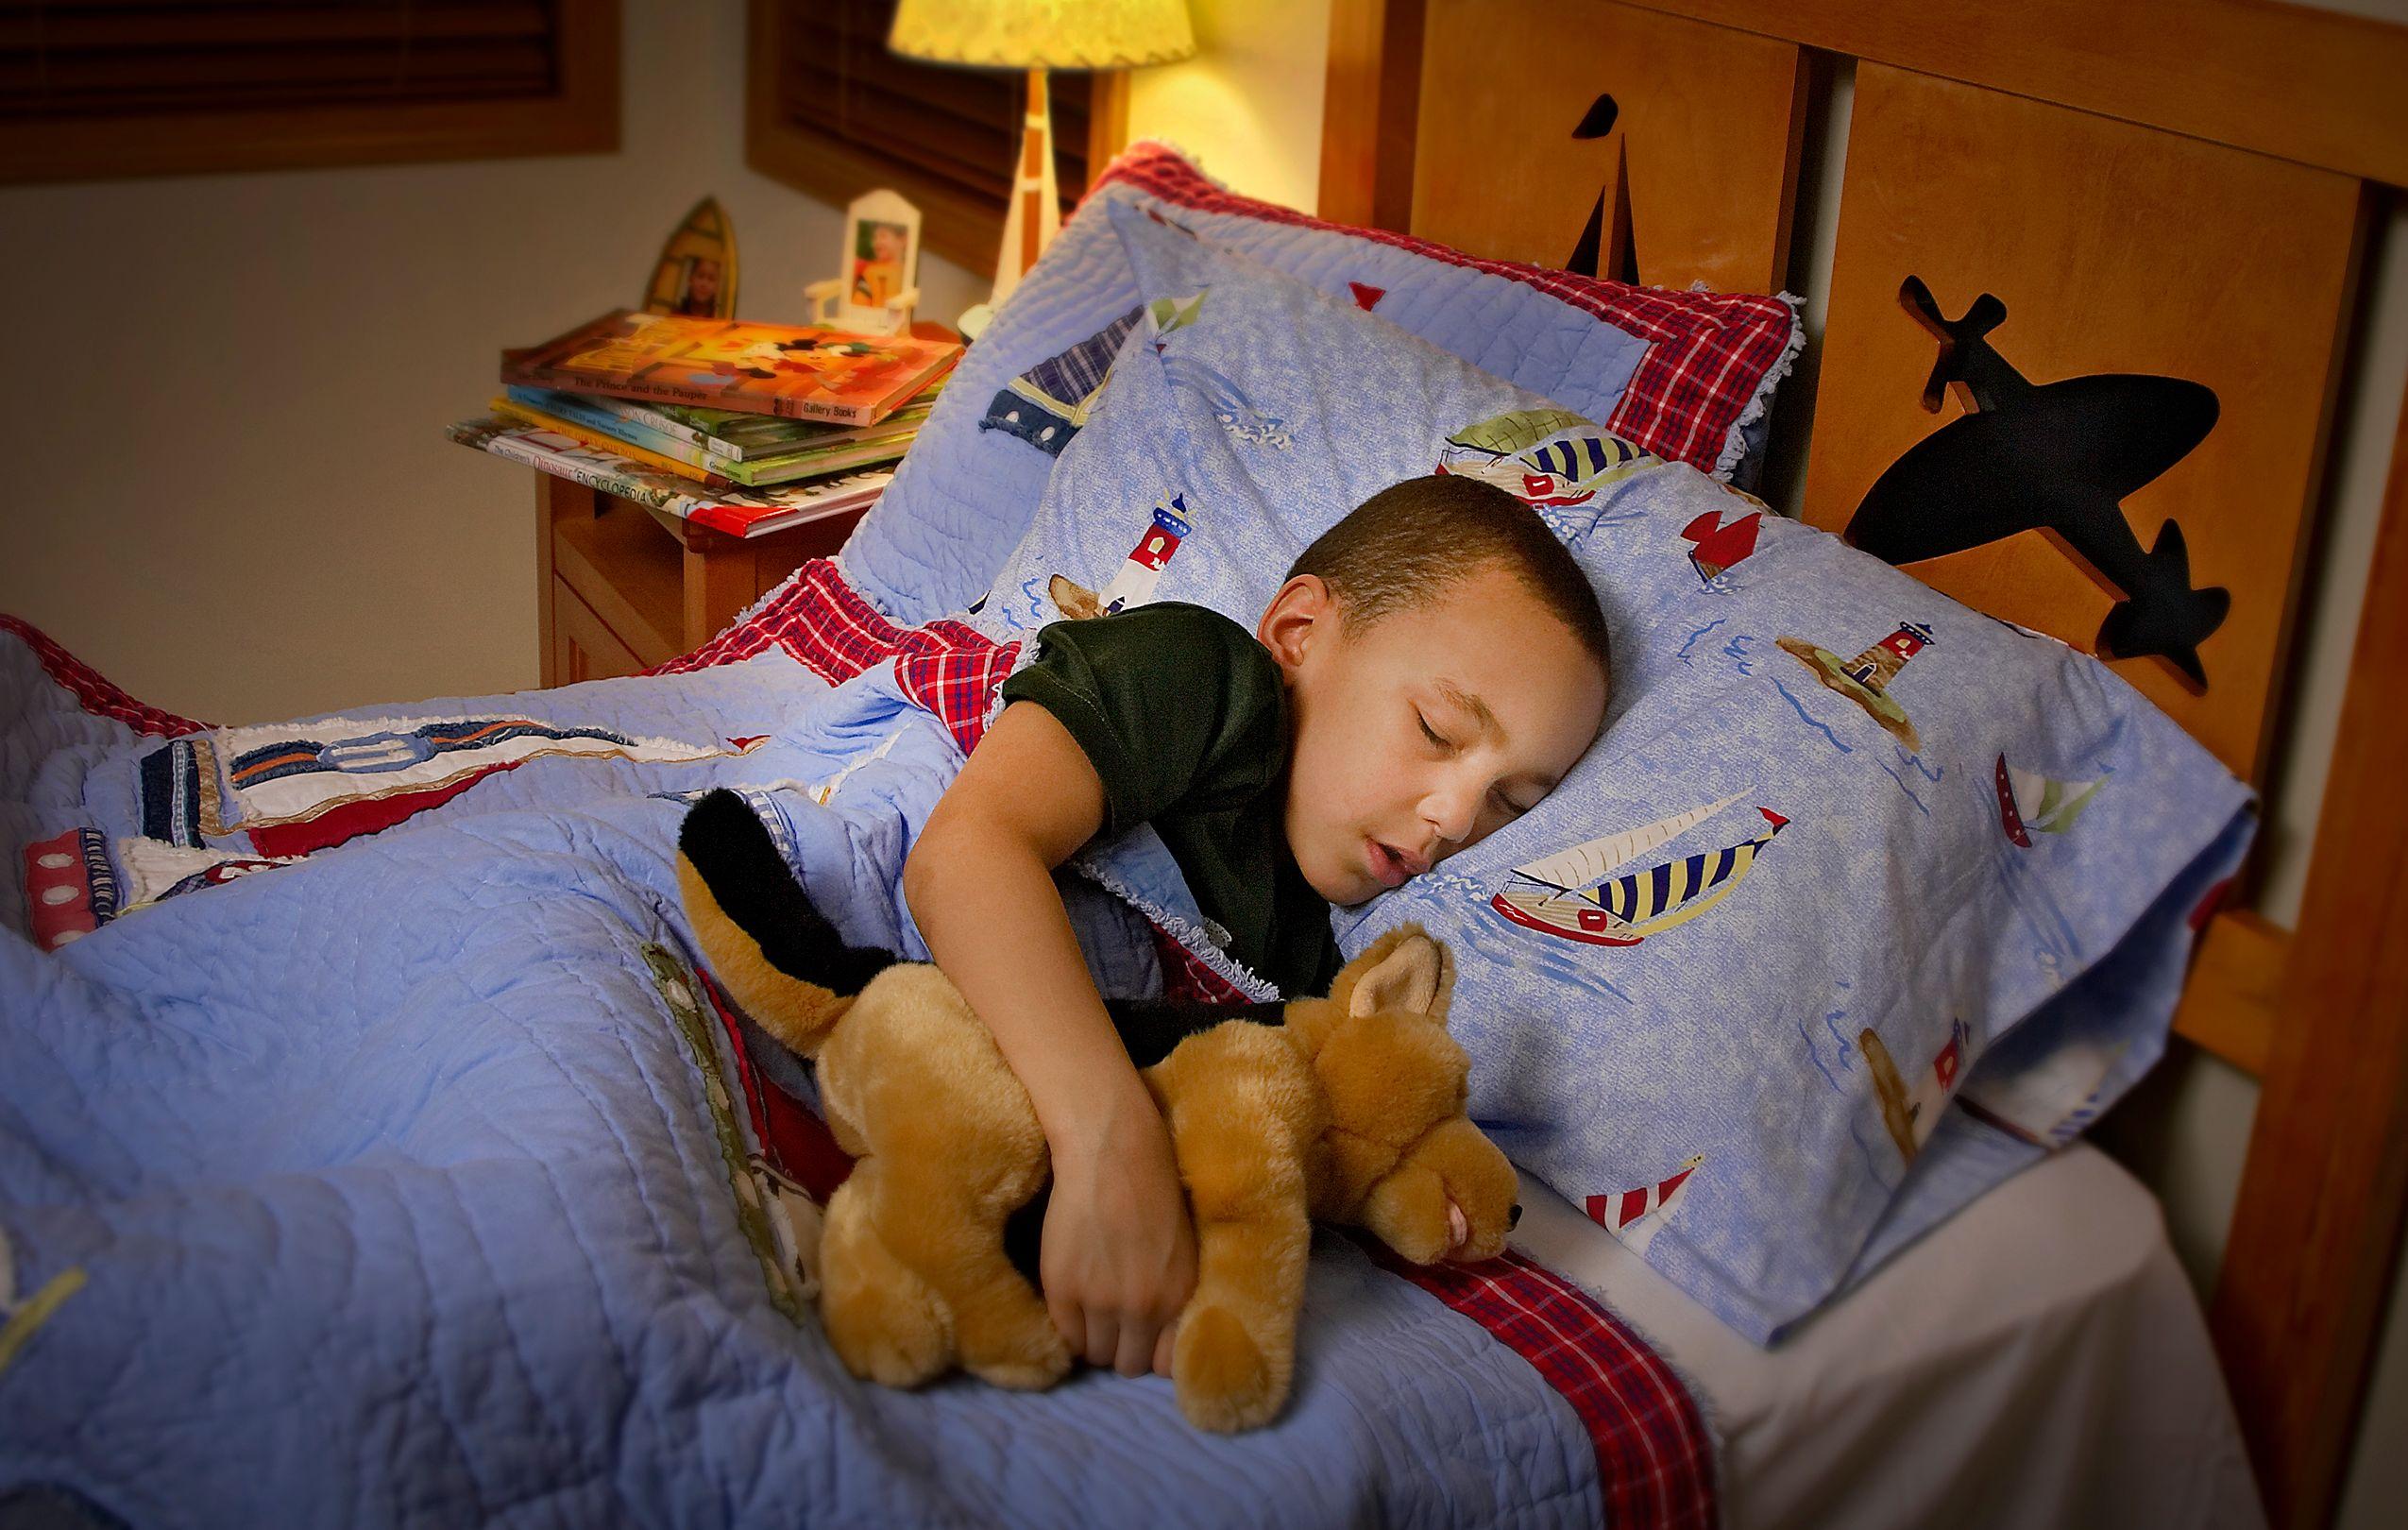 RP_Boy_Sleeping_036480_F.jpg